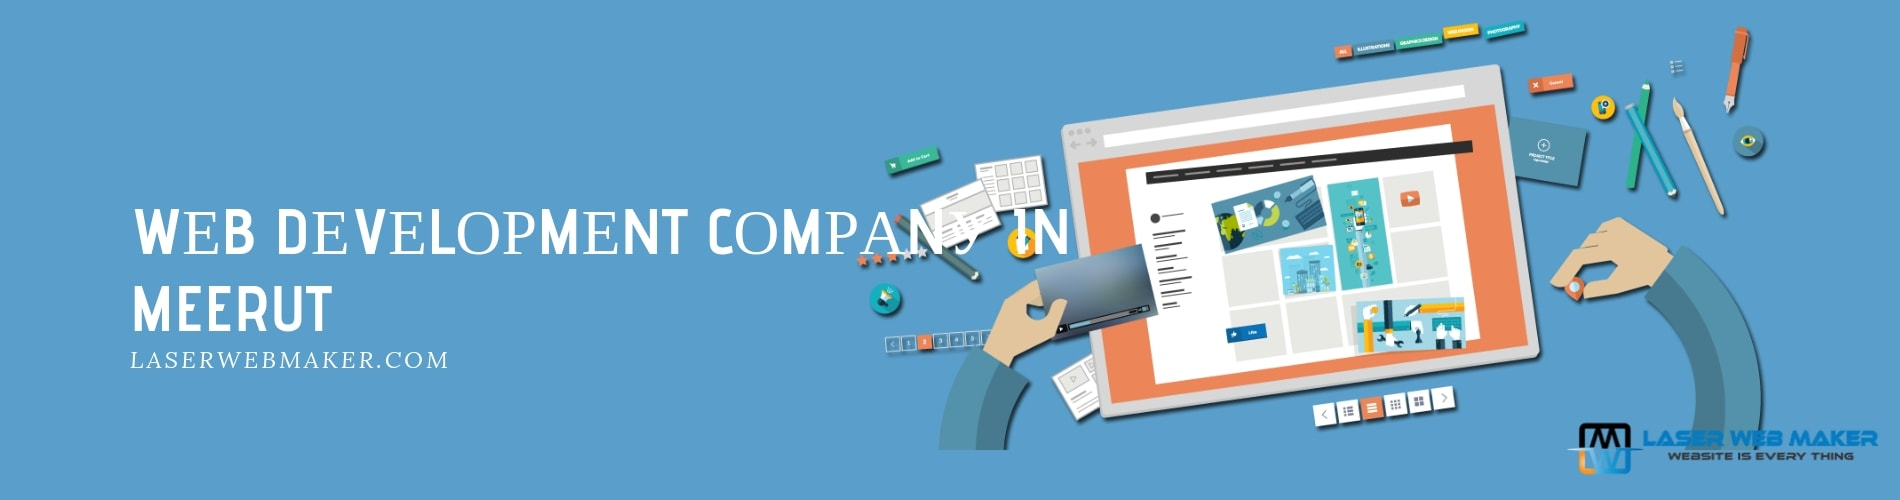 web development company in meerut